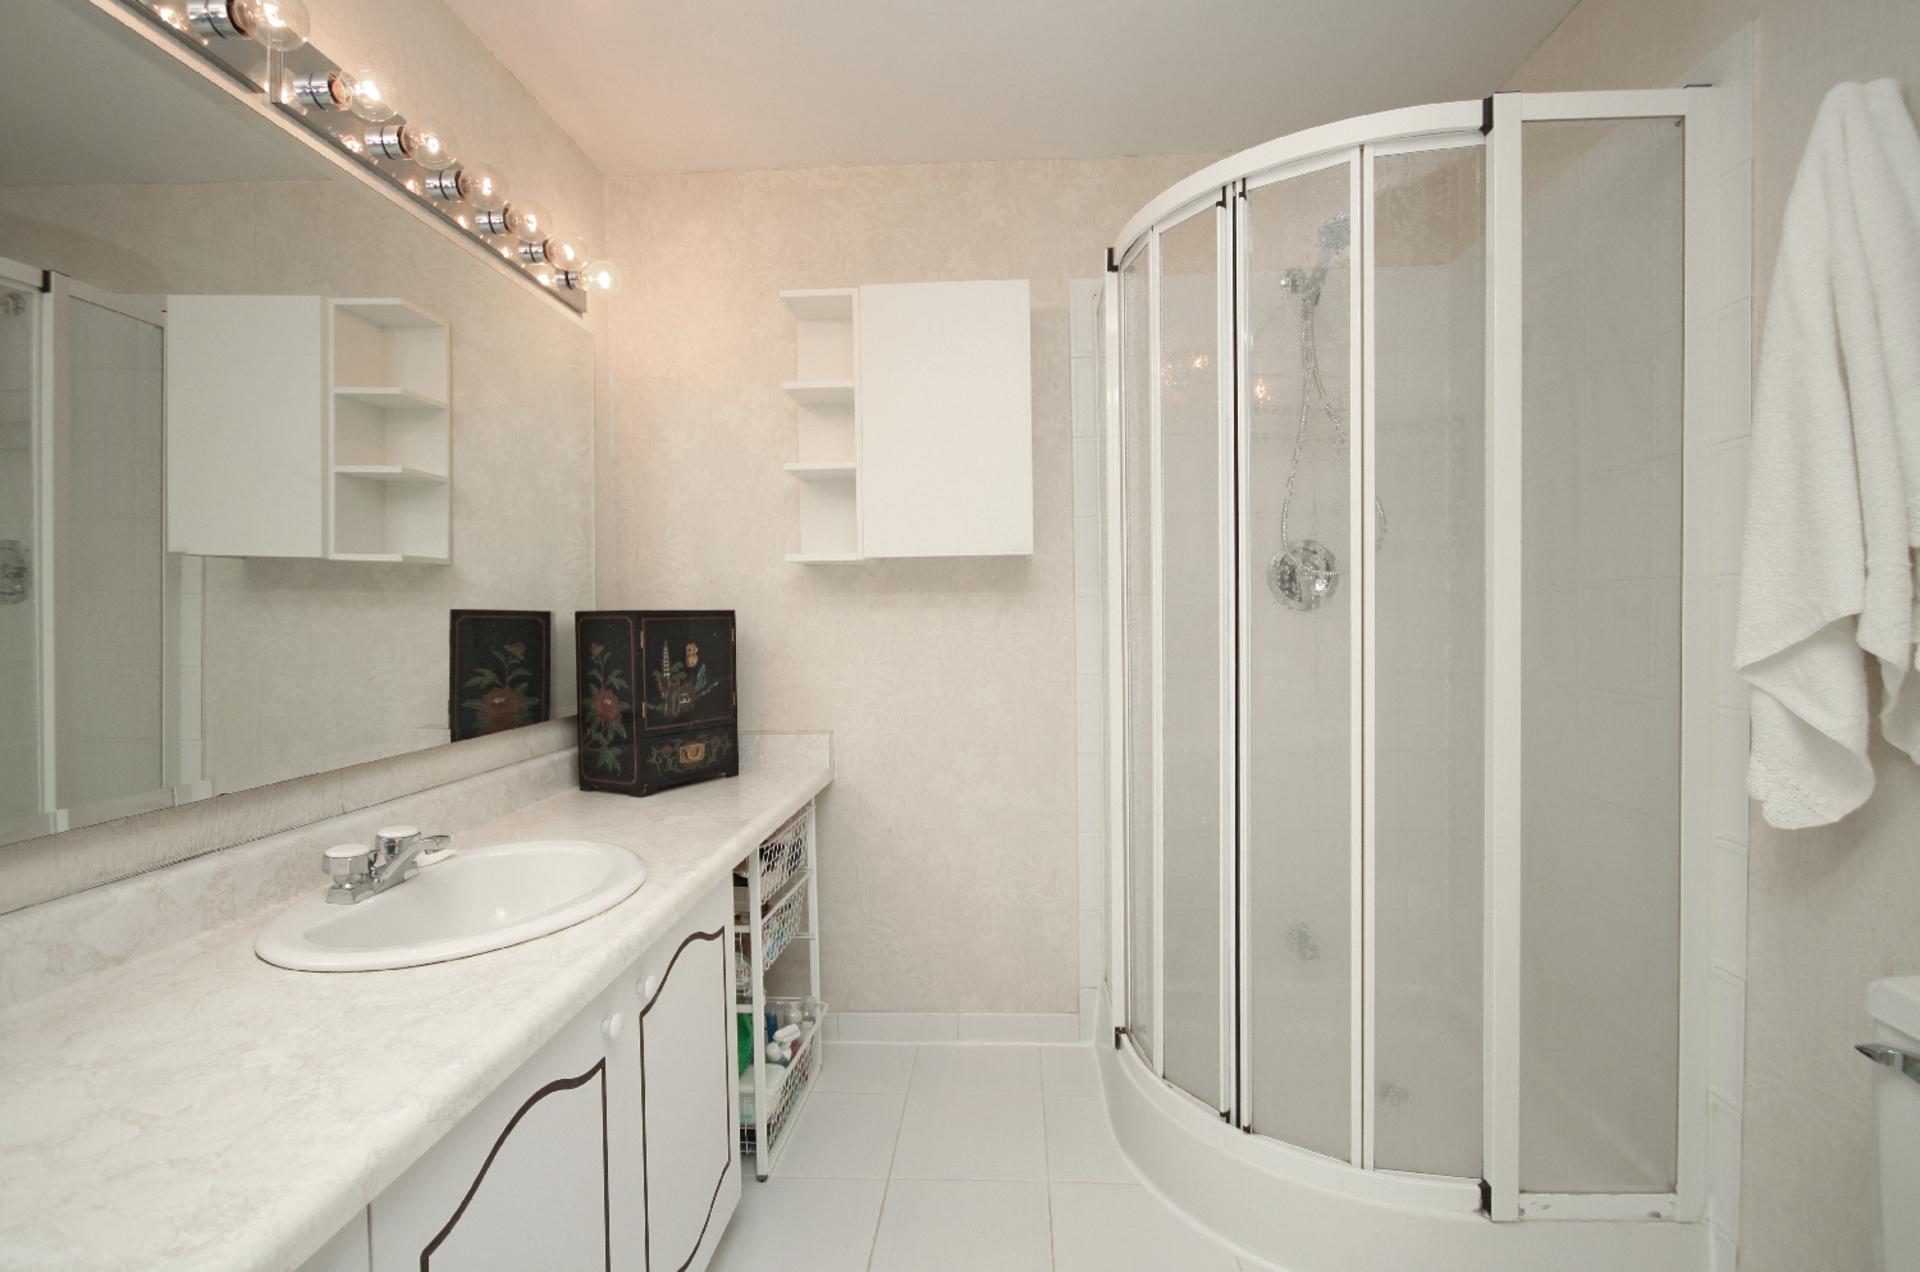 3 Piece Ensuite Bathroom at 93 Dutch Myrtle Way, Banbury-Don Mills, Toronto